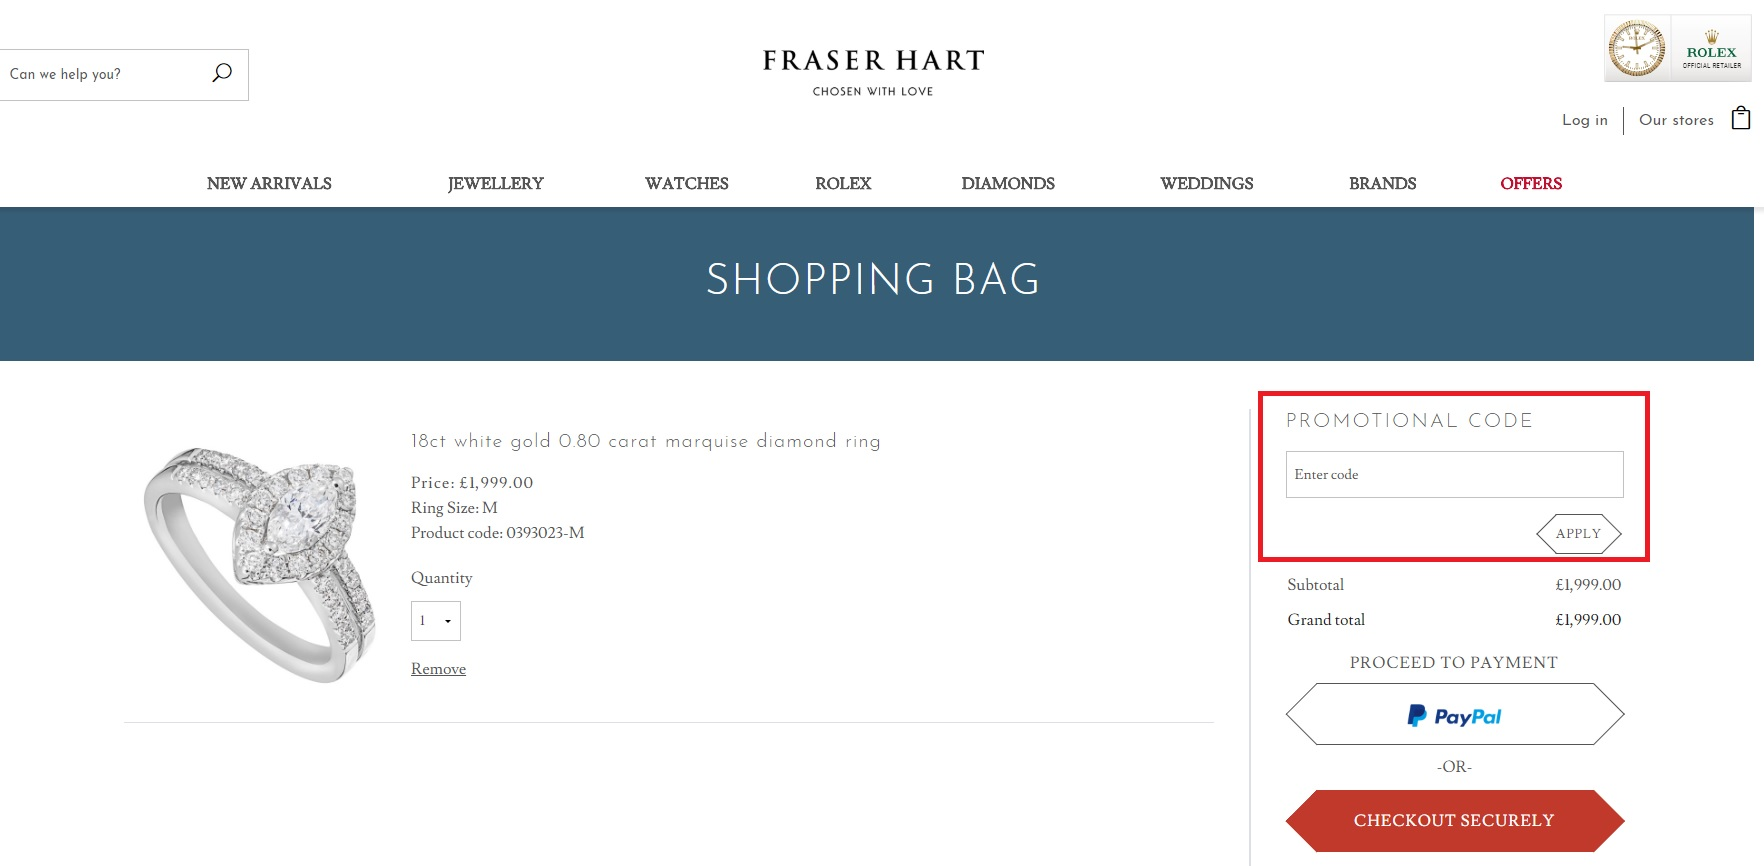 Fraser Hart Voucher Code Basket